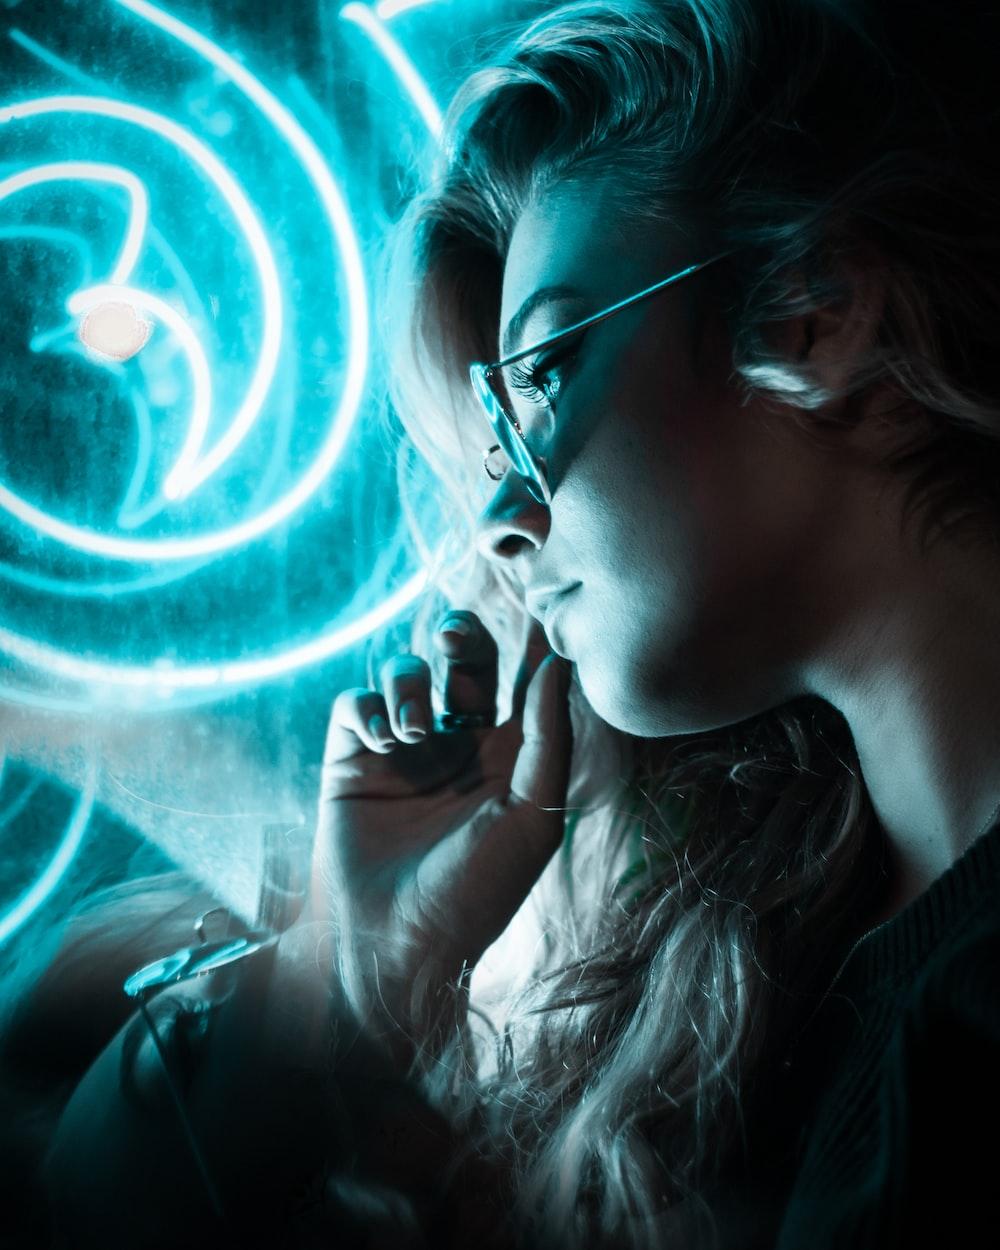 woman wearing sunglasses near blue neon lights